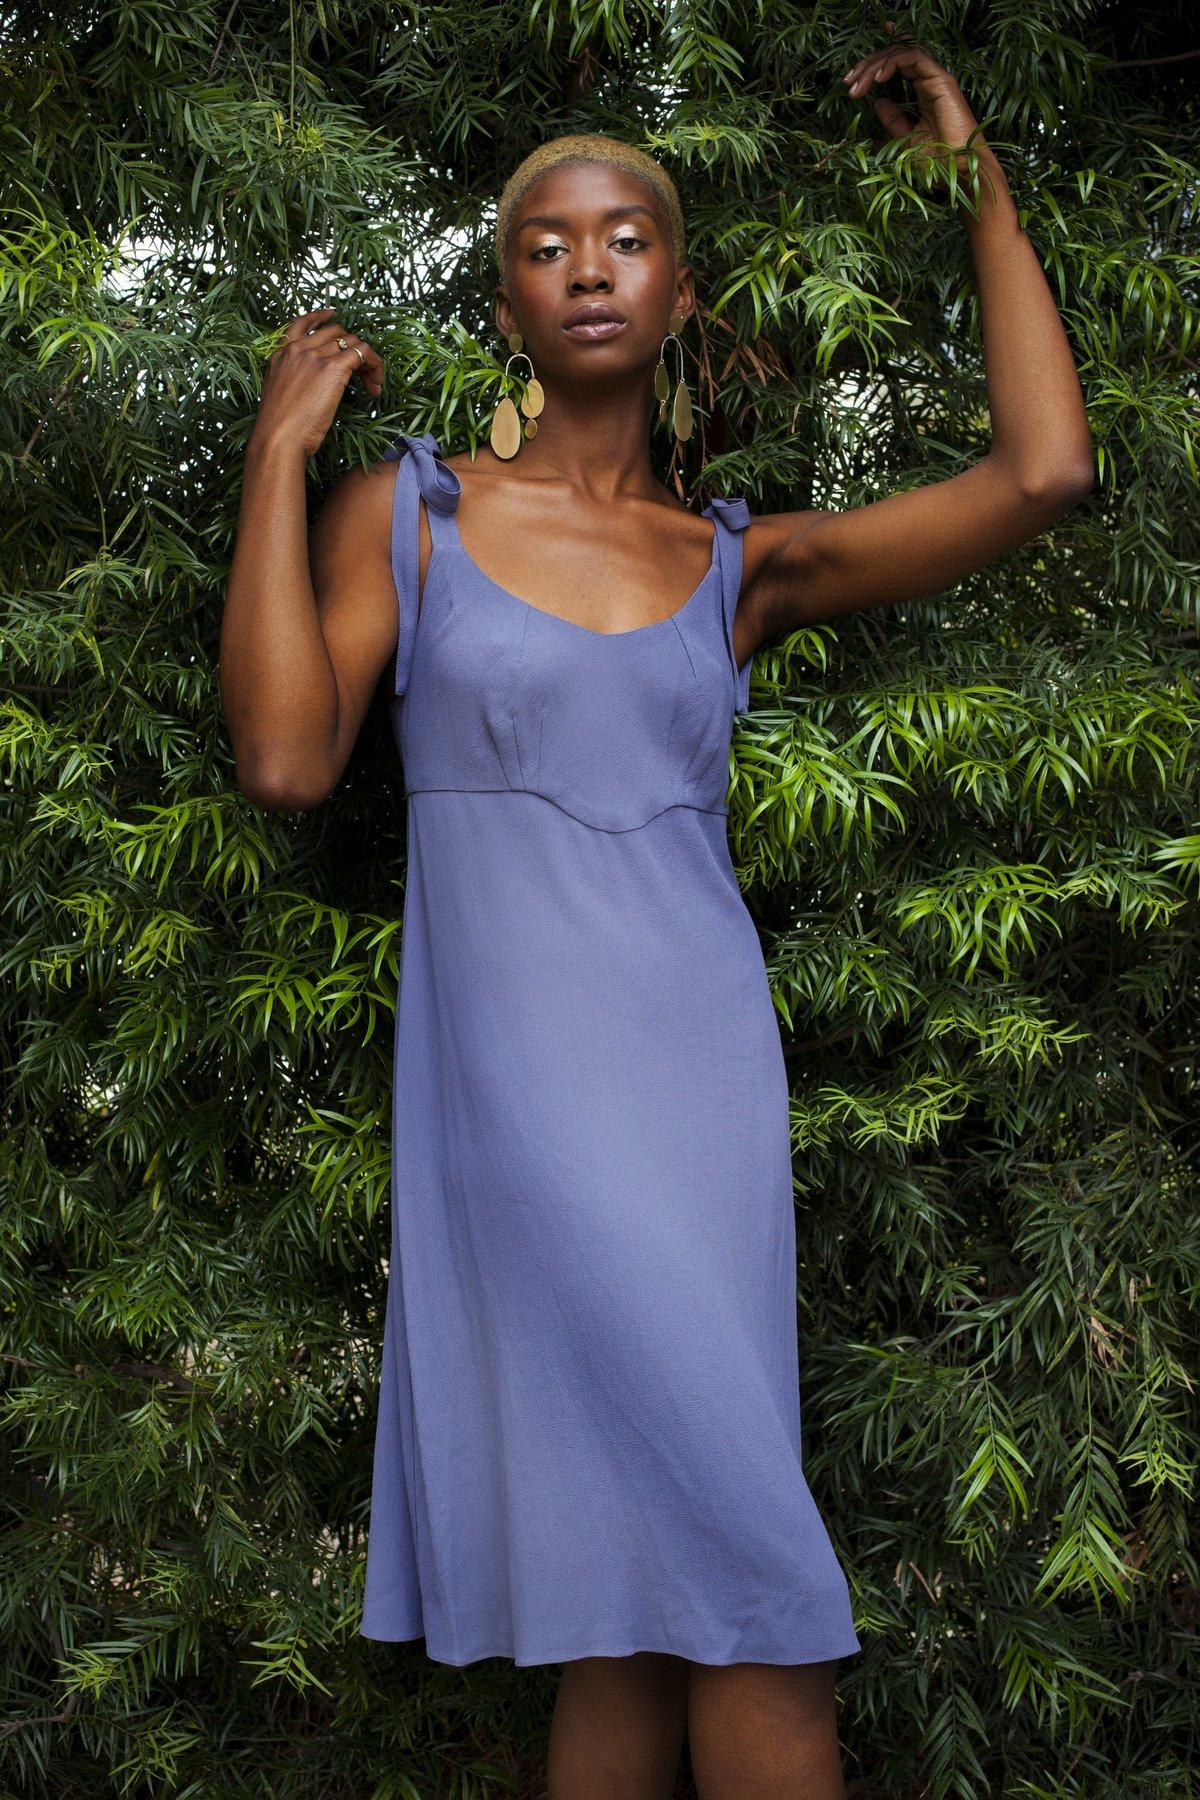 5a27bdff4d00 Myrtle Sofia Dress | Garmentory